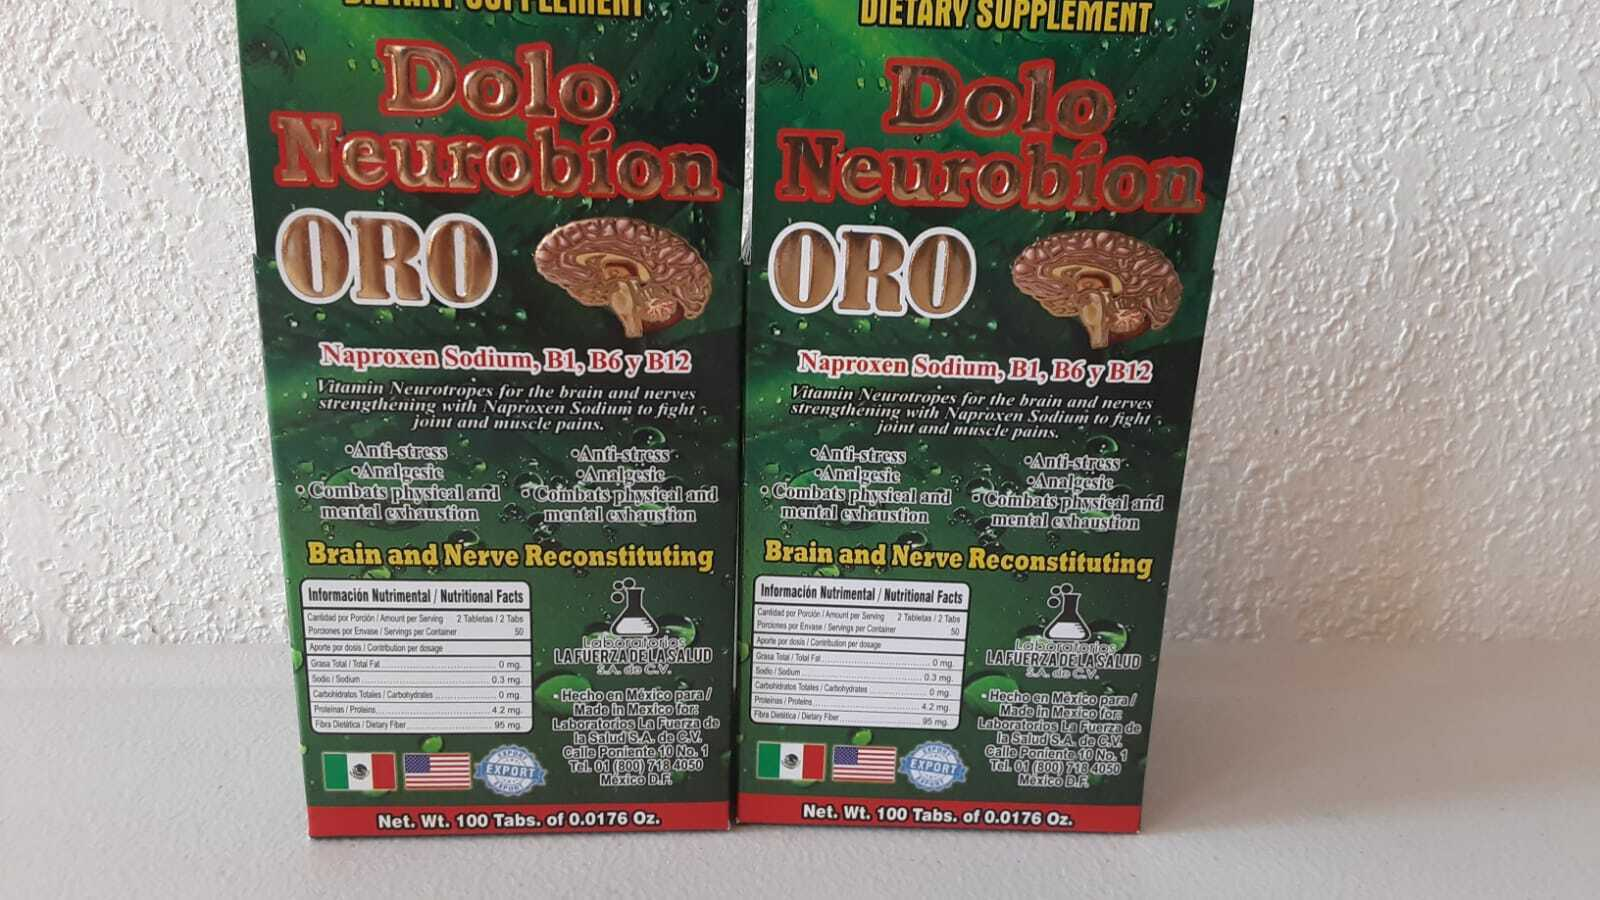 2 PACK Dolo Neurobion Oro Naproxen Sodium, Vitamins B1, B6 and B12 Stress Relief